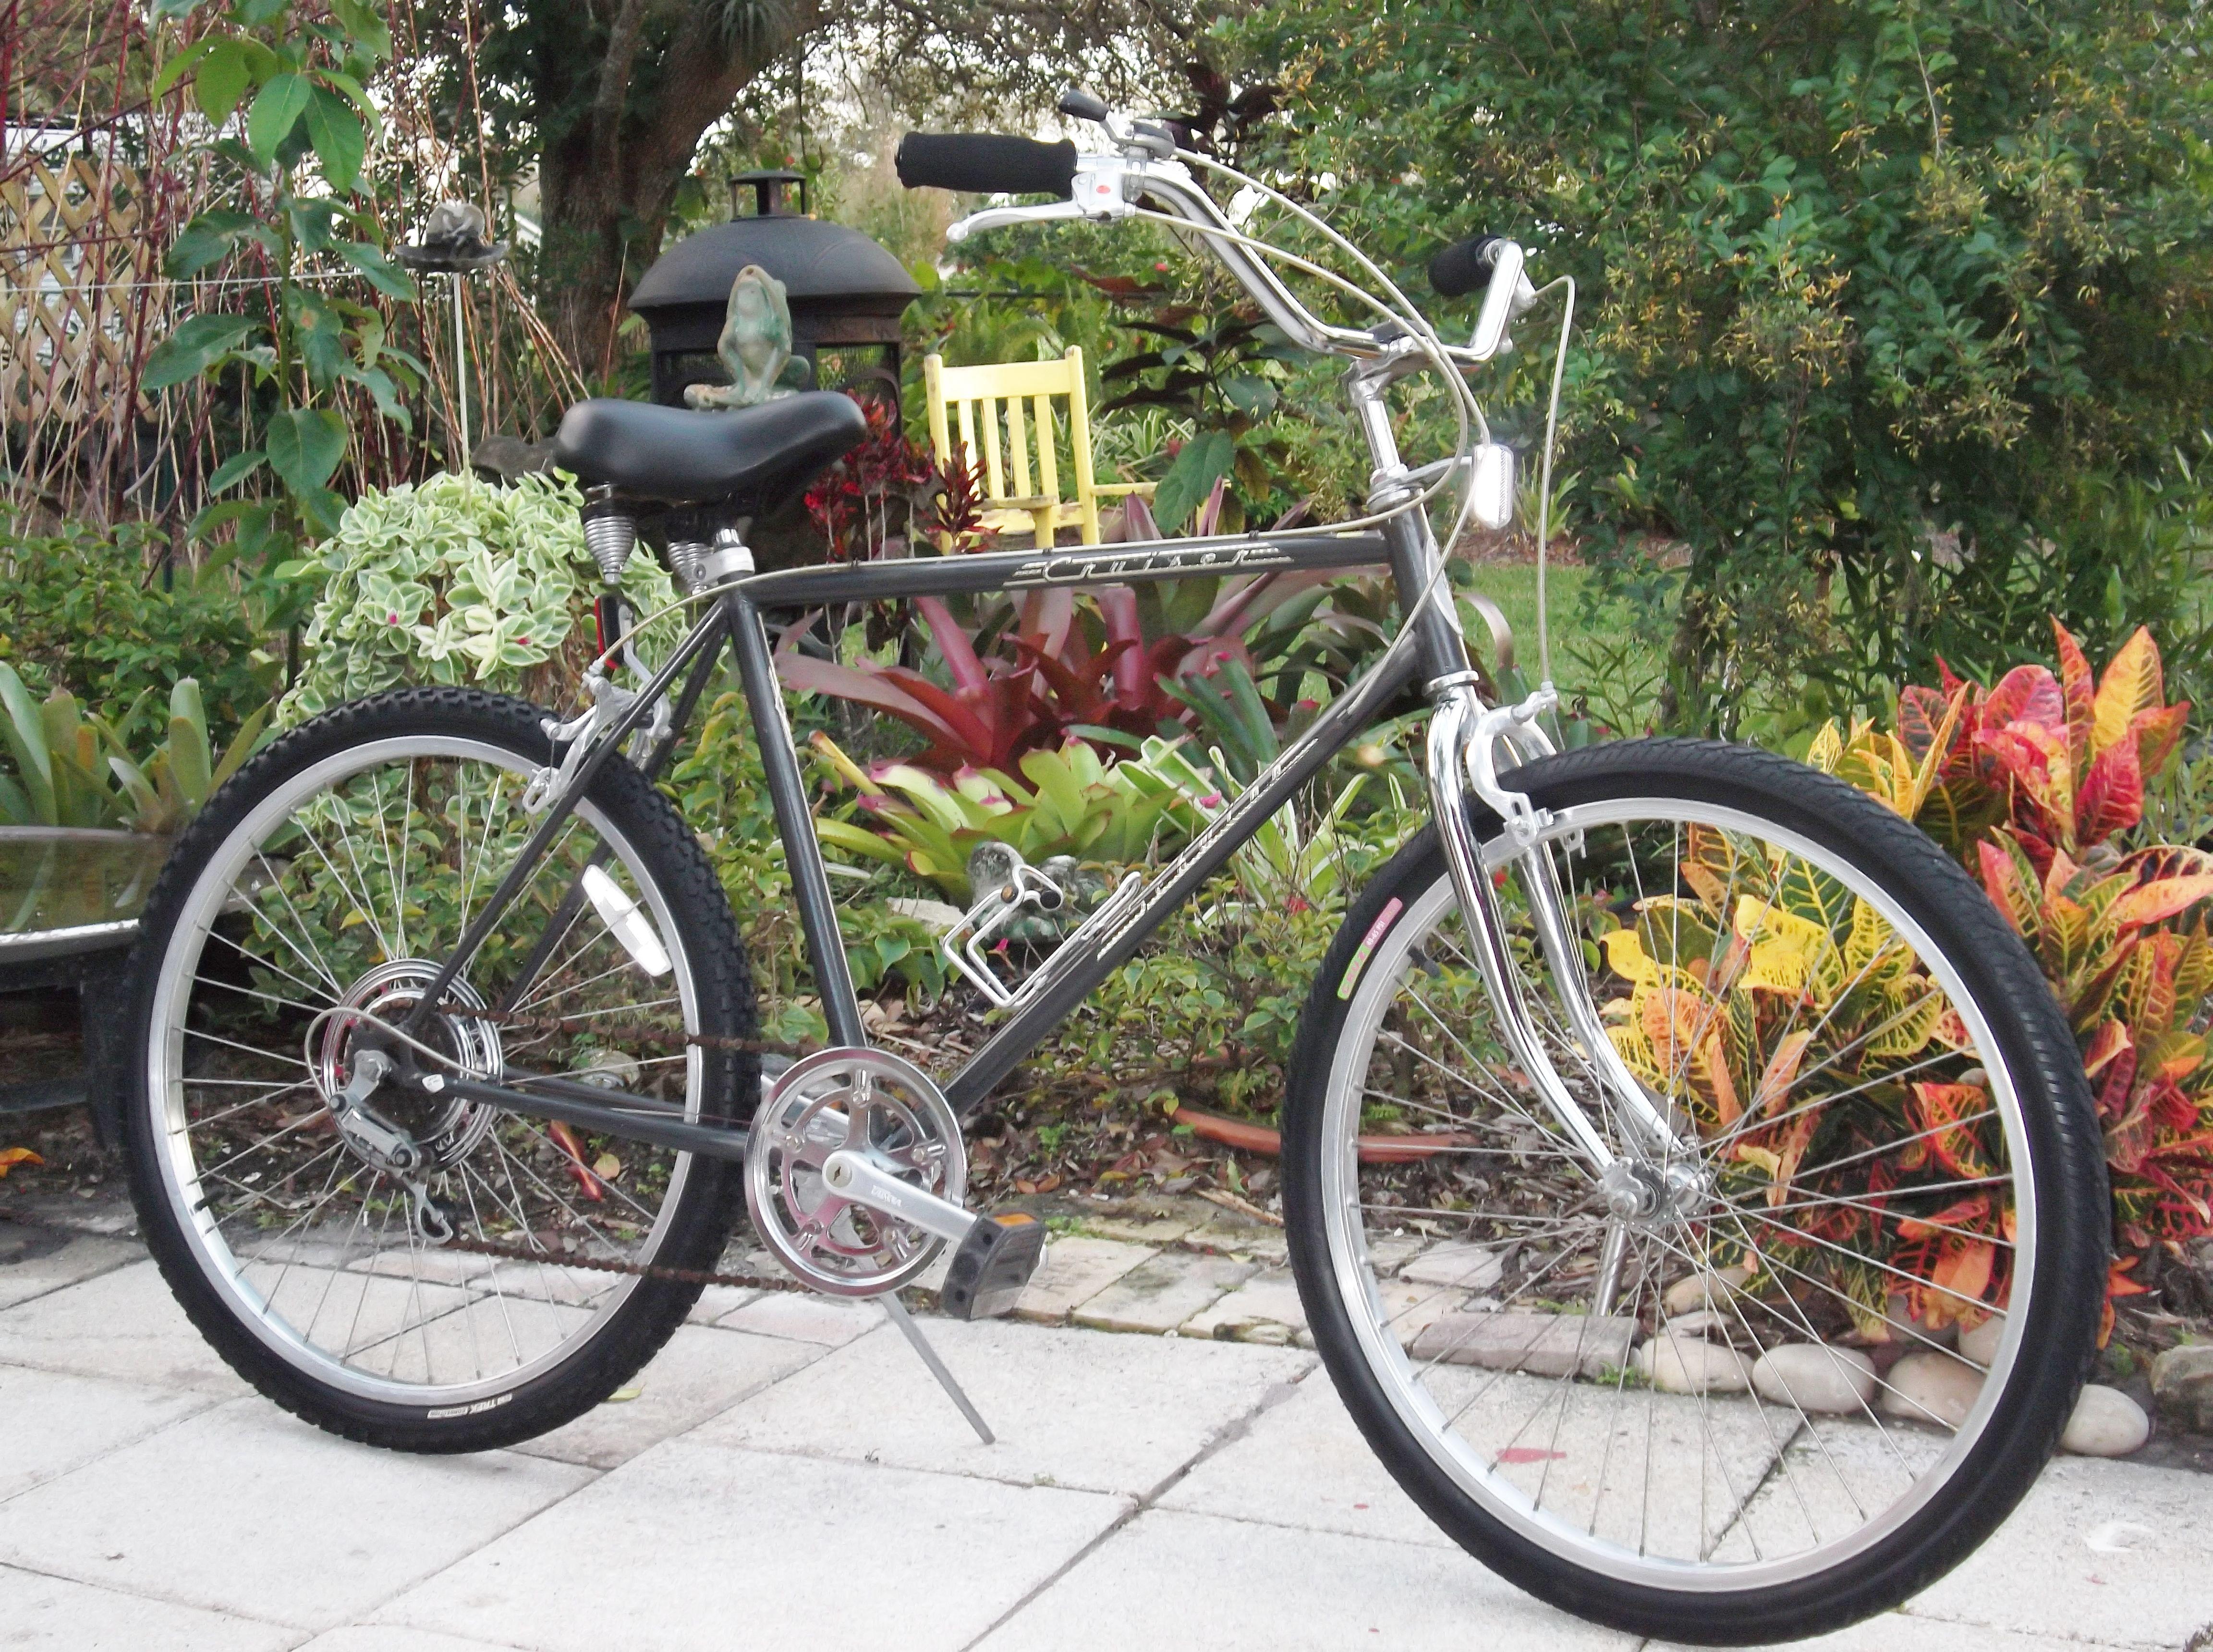 6 speed schwinn cruiser | vans restored bikes | Bike, Vehicles, Bicycle